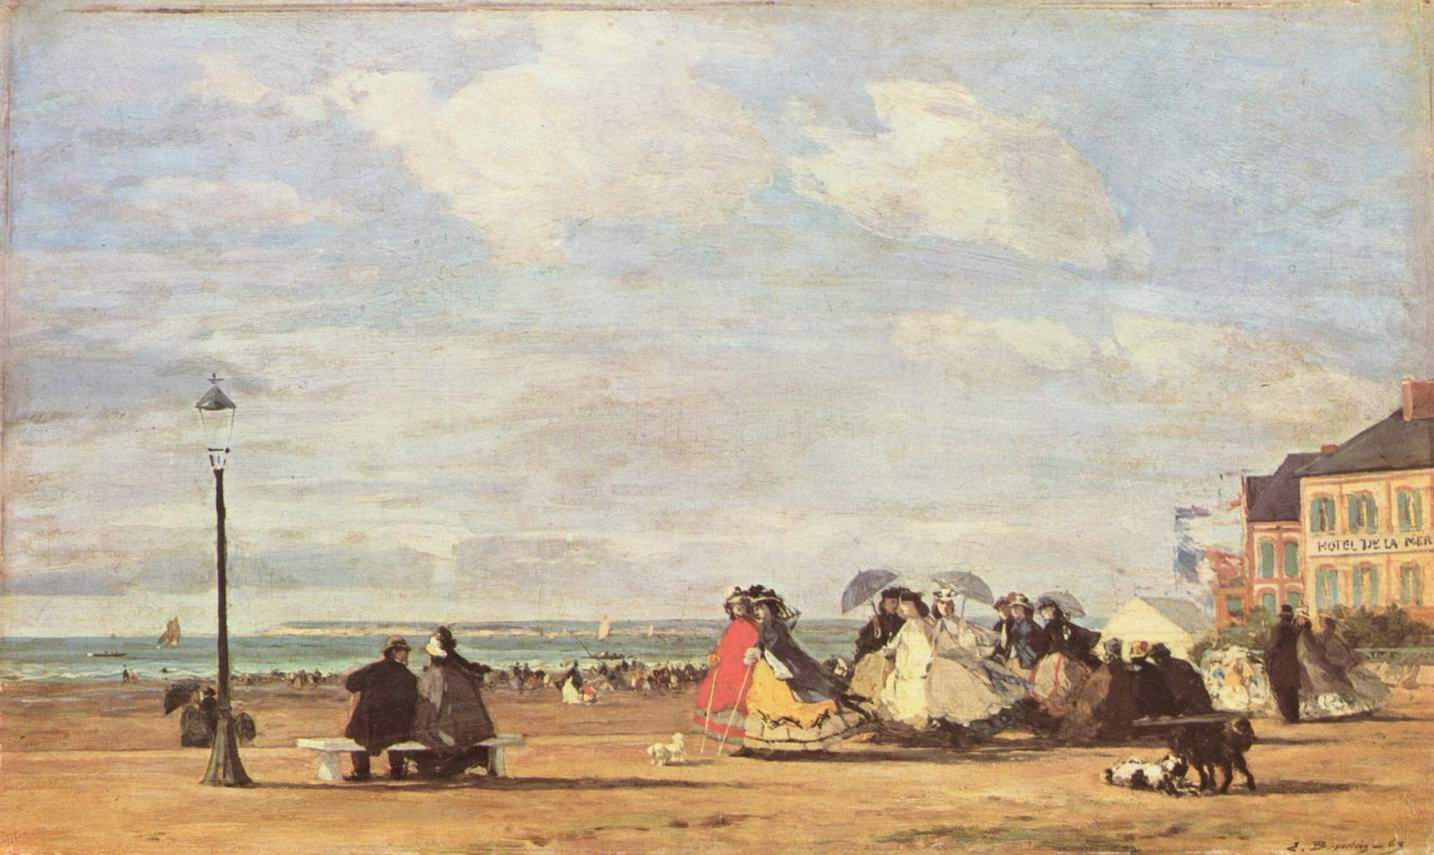 Императрица Евгения на морском побережье в Трувиле, Буден Эжен